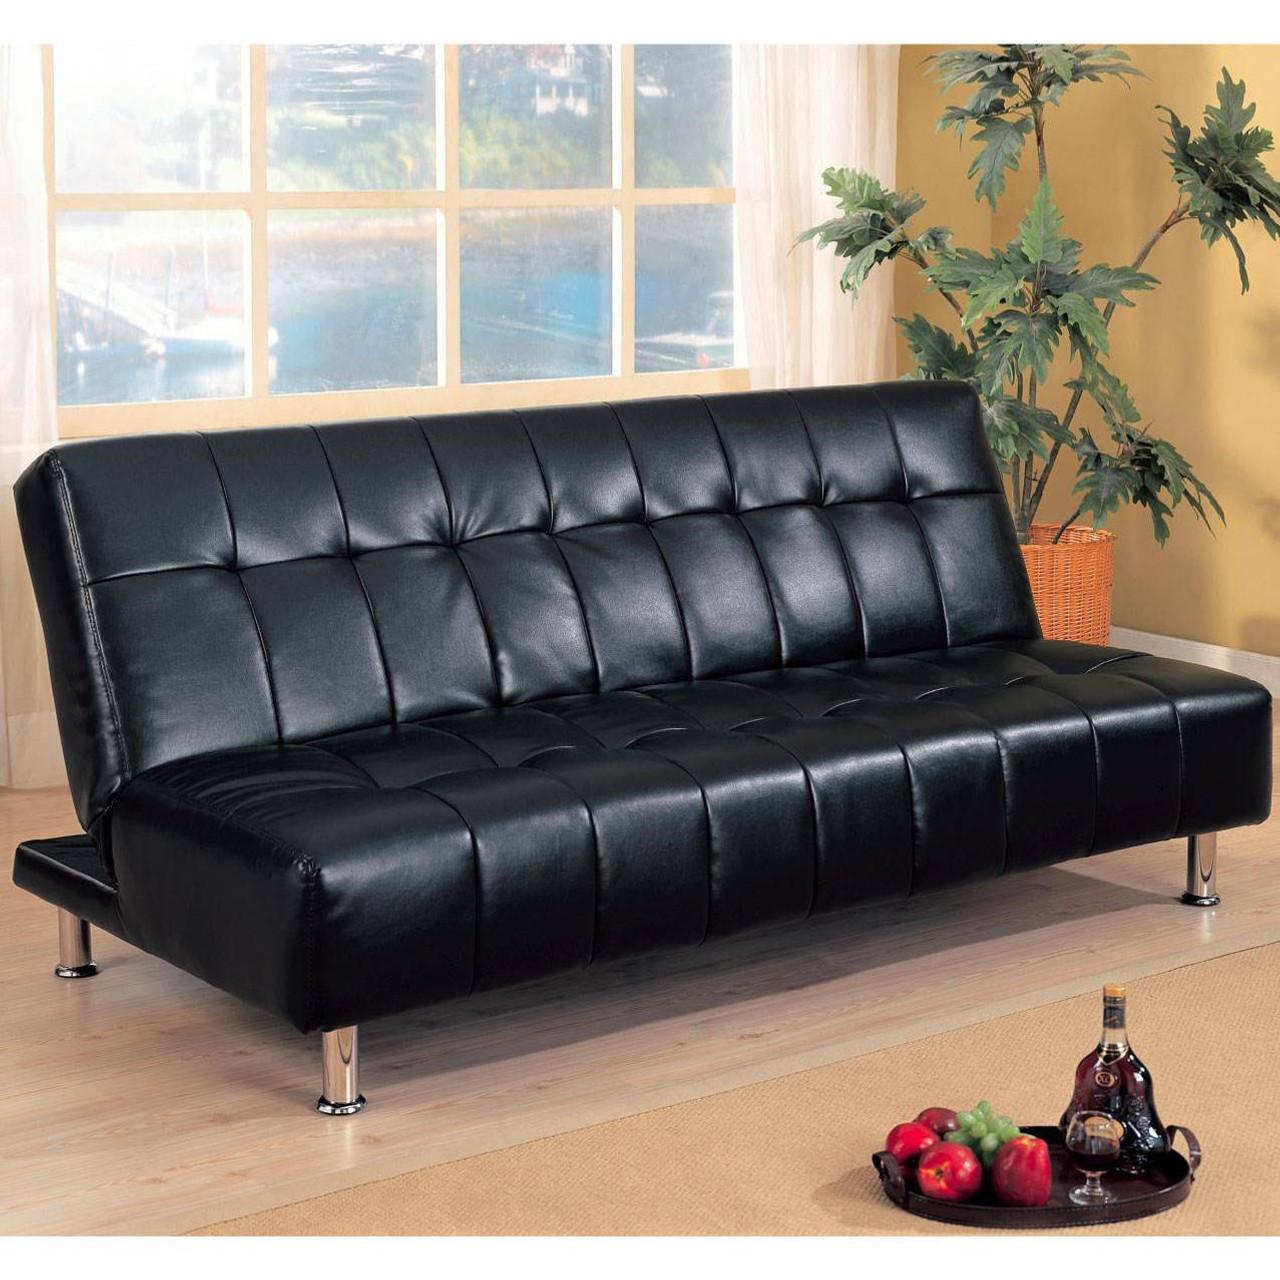 Coaster Maryland Contemporary Sofa Bed in Black - DealBeds.com